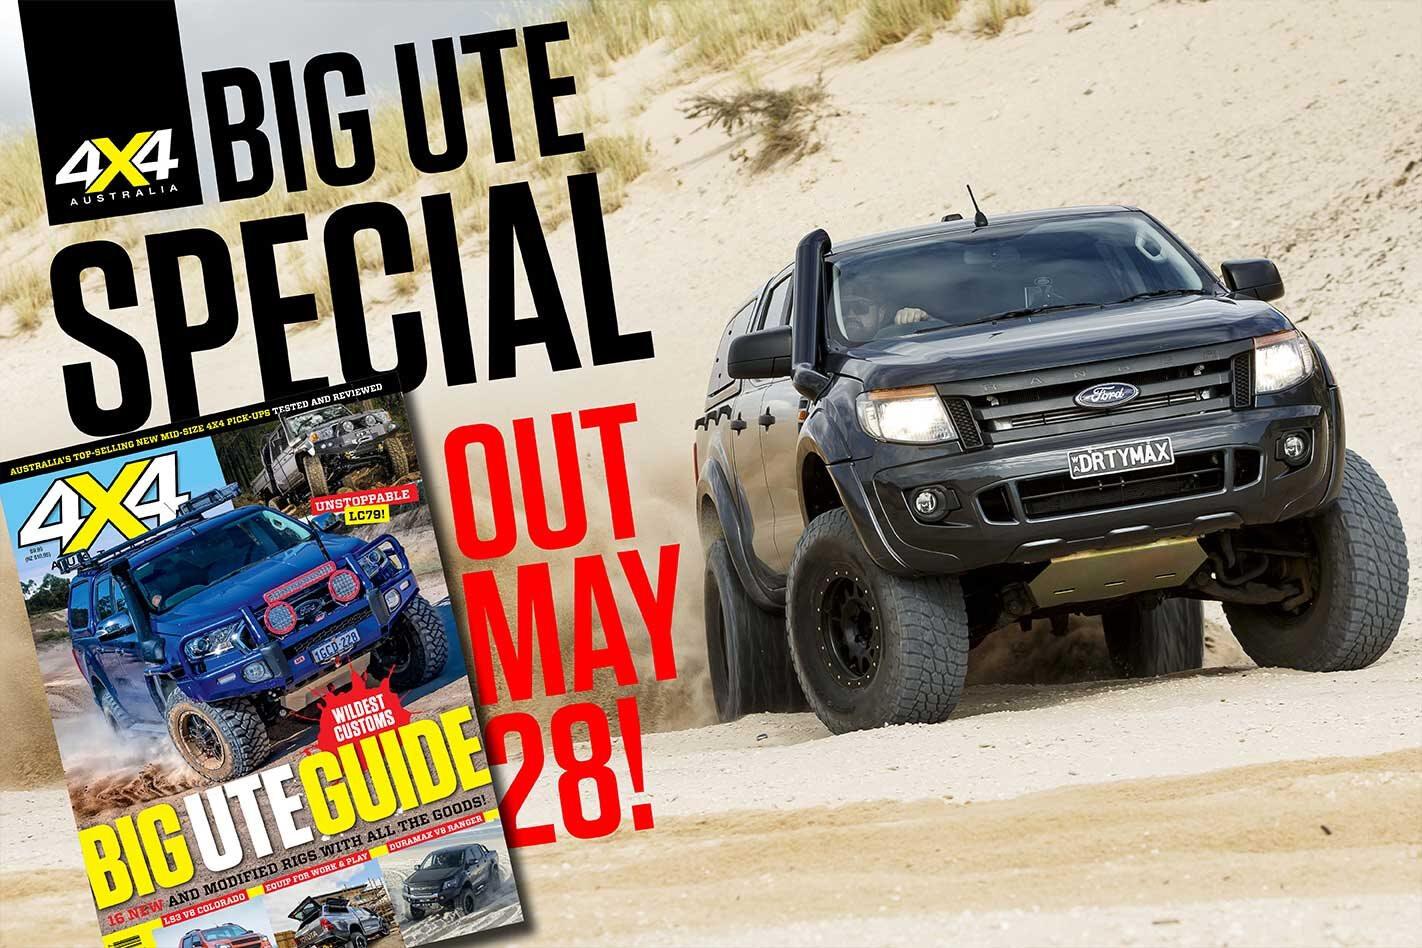 4 X 4 Australia Ute Special May 28 Jpg